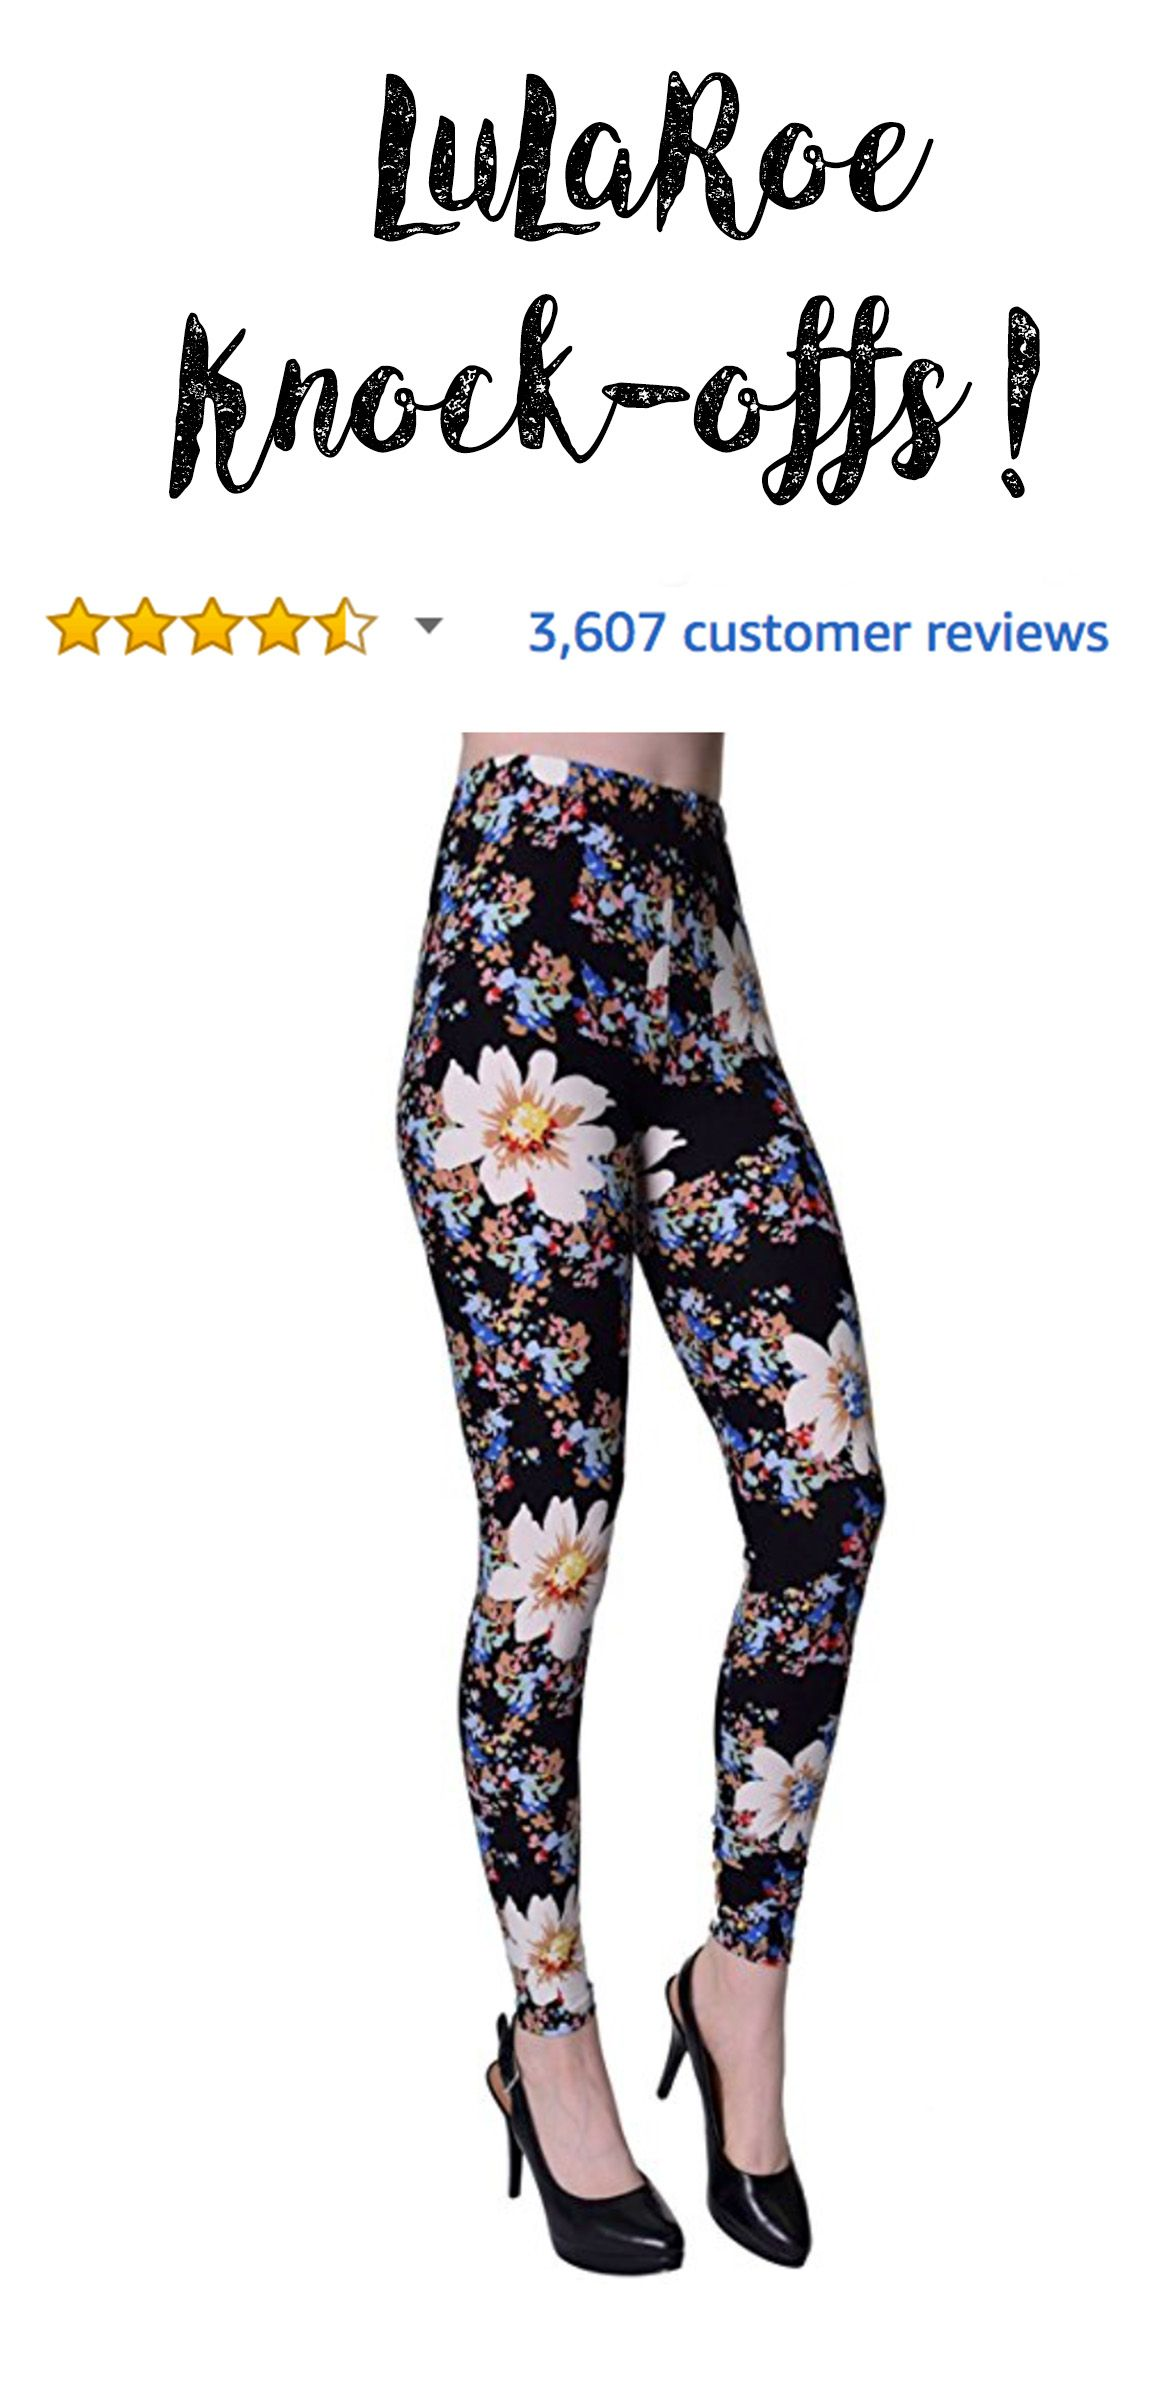 907f6043dd606 LuLaRoe knock off, lularoe alternative, cheap leggings, best leggings,  leggings that are half the price of lularoe, lularoe alternatives,  alternatives to ...